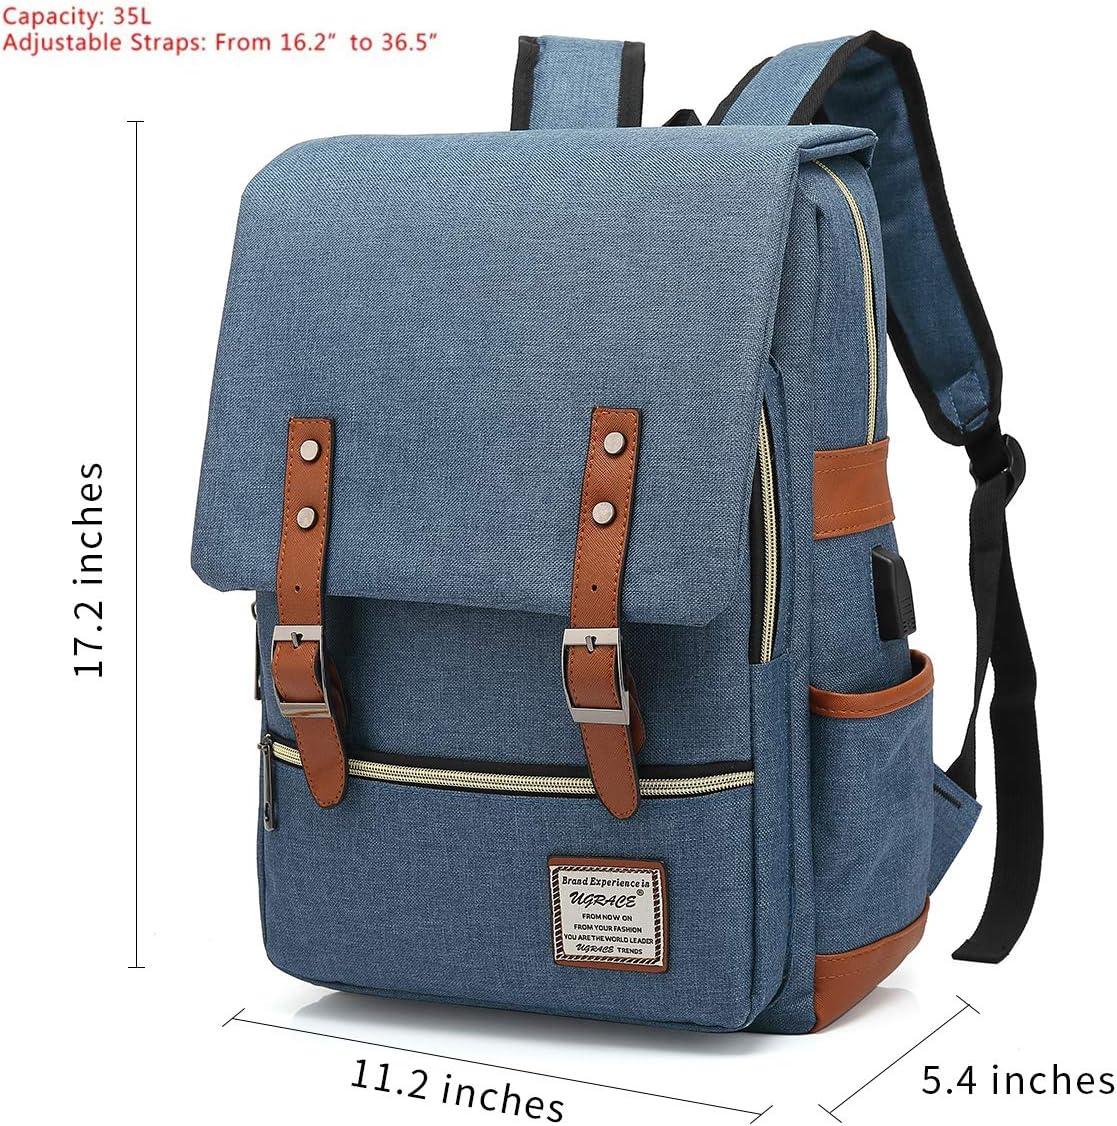 UGRACE Vintage Laptop Backpack with USB Charging Port, Elegant Water Resistant Travelling Backpack Casual Daypacks School Shoulder Bag for Men Women, Fits up to 15.6Inch Laptop in Blue